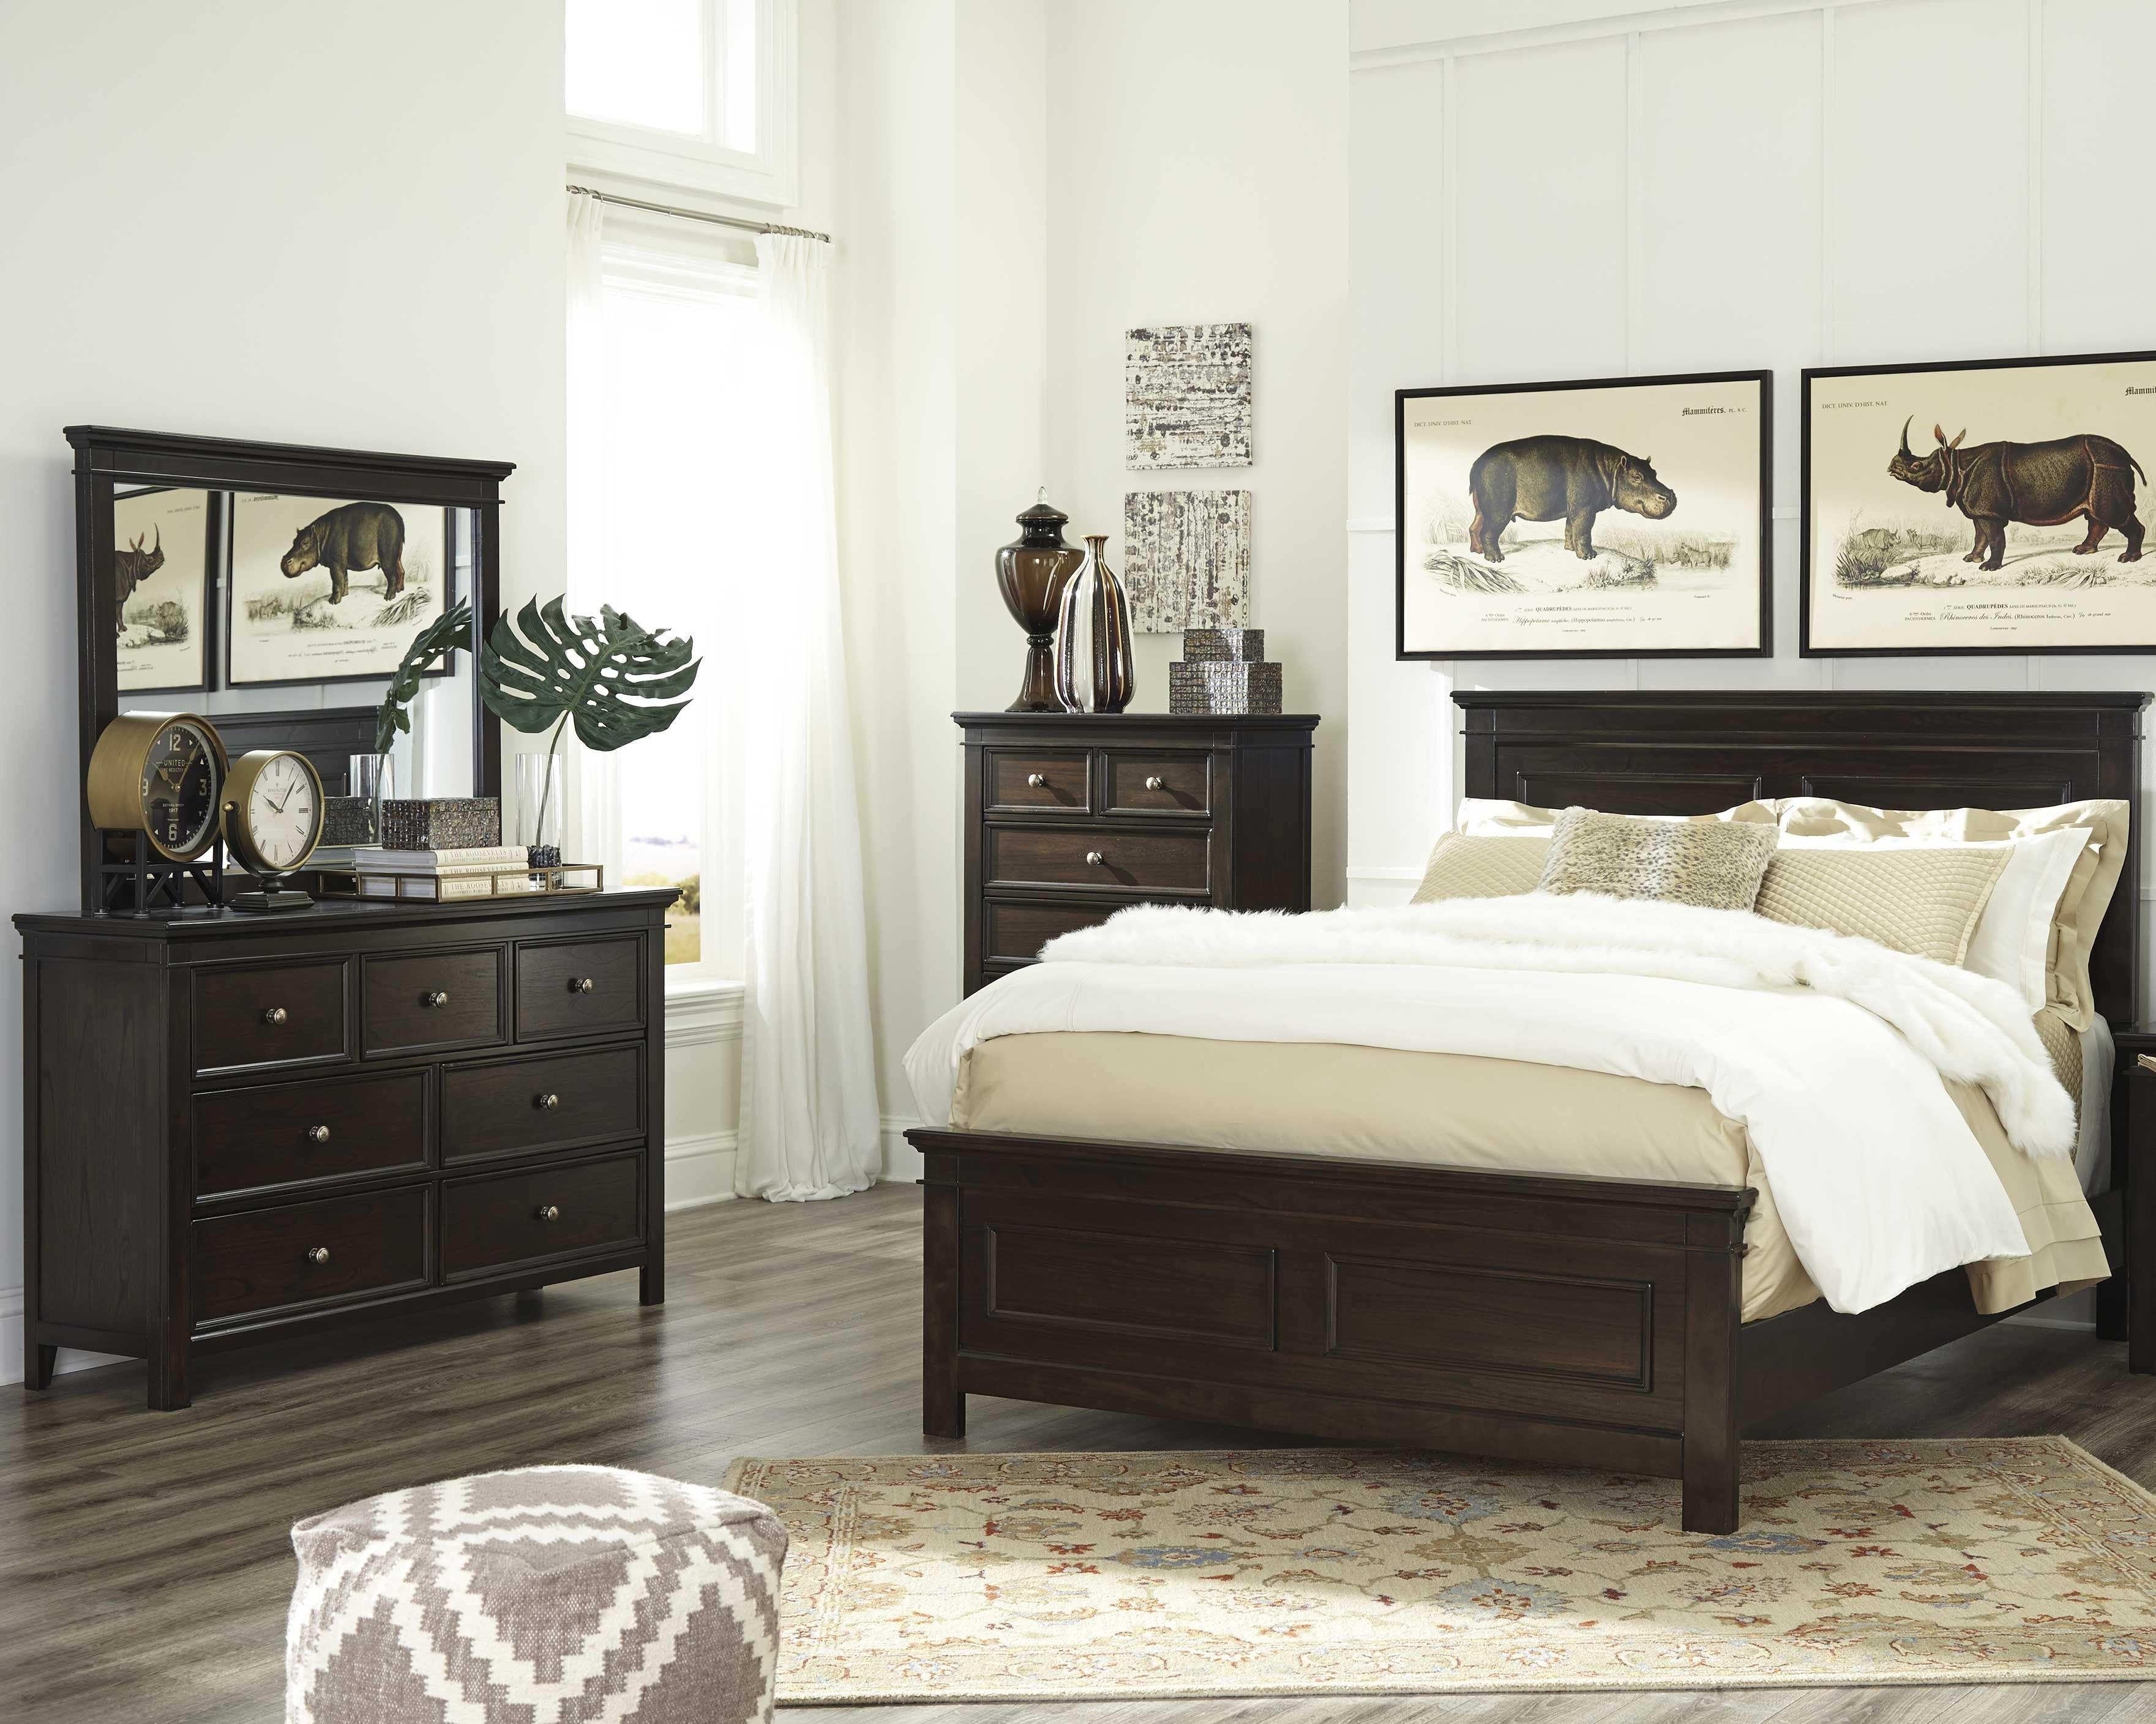 Boy Bedroom Furniture Set Lovely Alexee 5 Piece King Bedroom Dark Brown